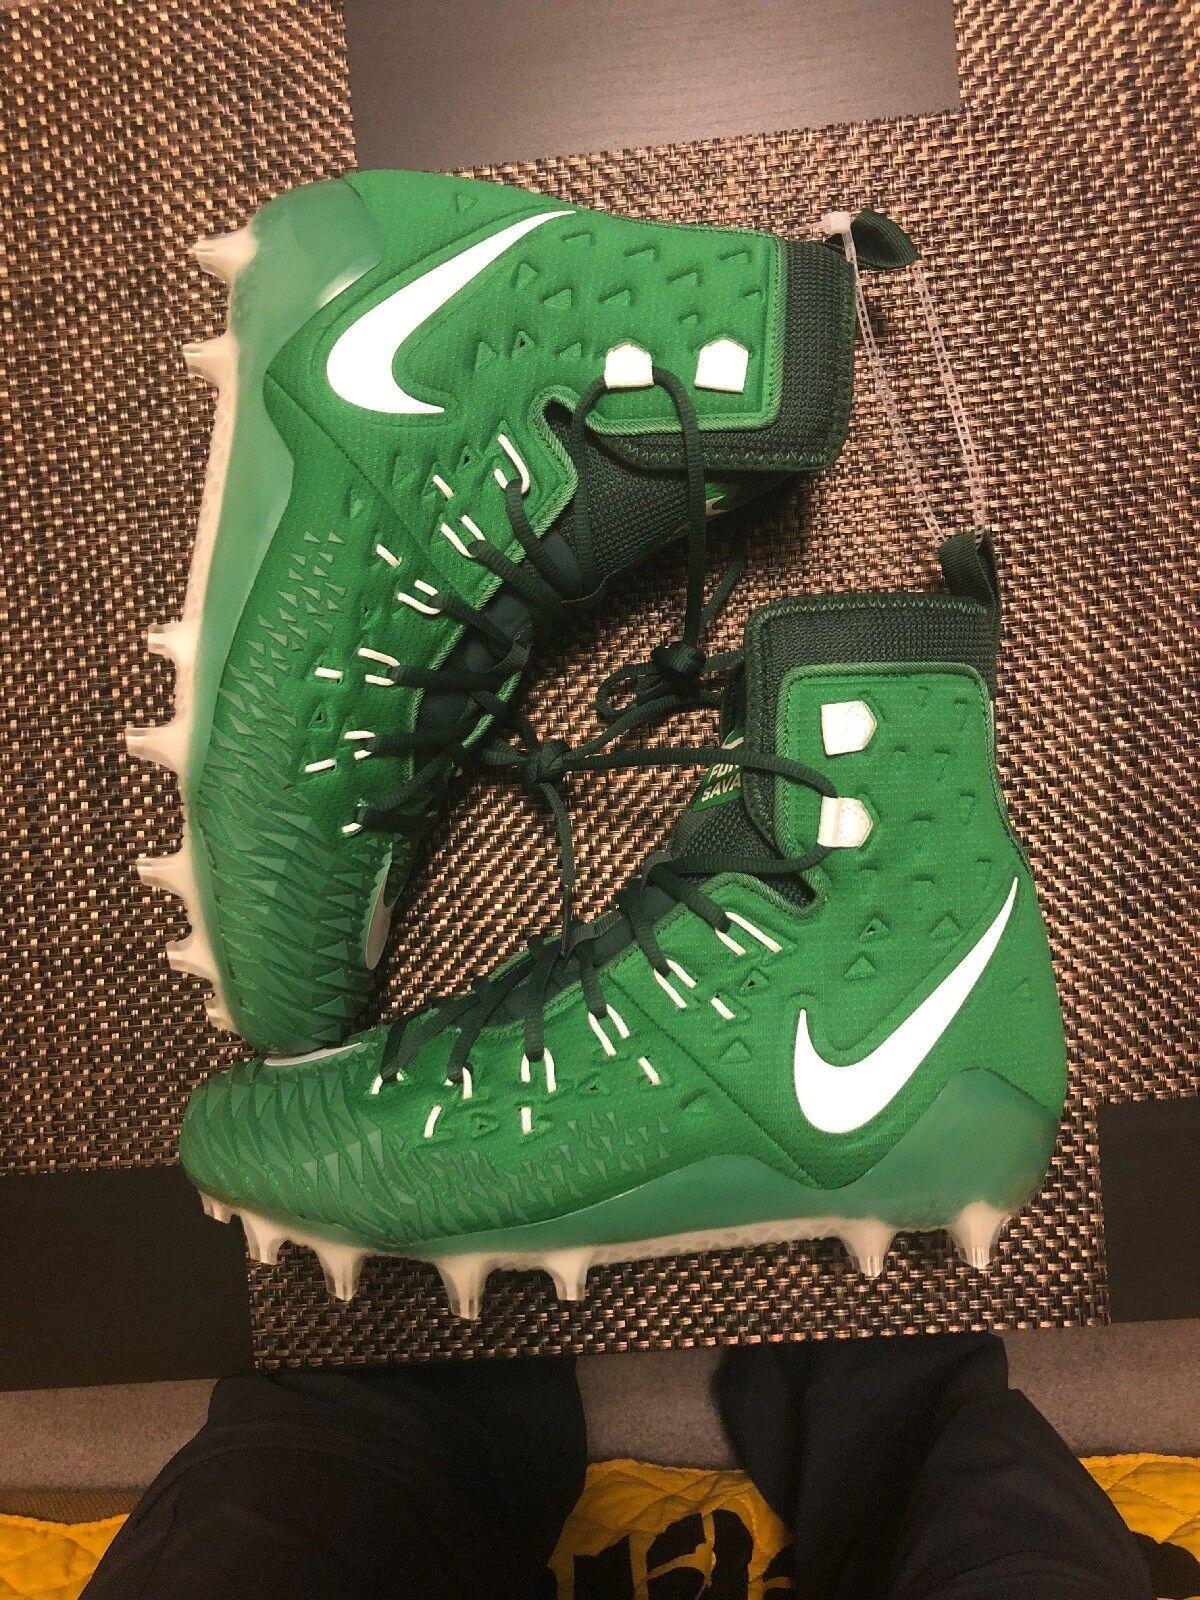 545953ea0 NIke Zoom Savage Elite TD Football Cleats Green 857063-313 Size 11.5 Force  NEW npykow1870-Men